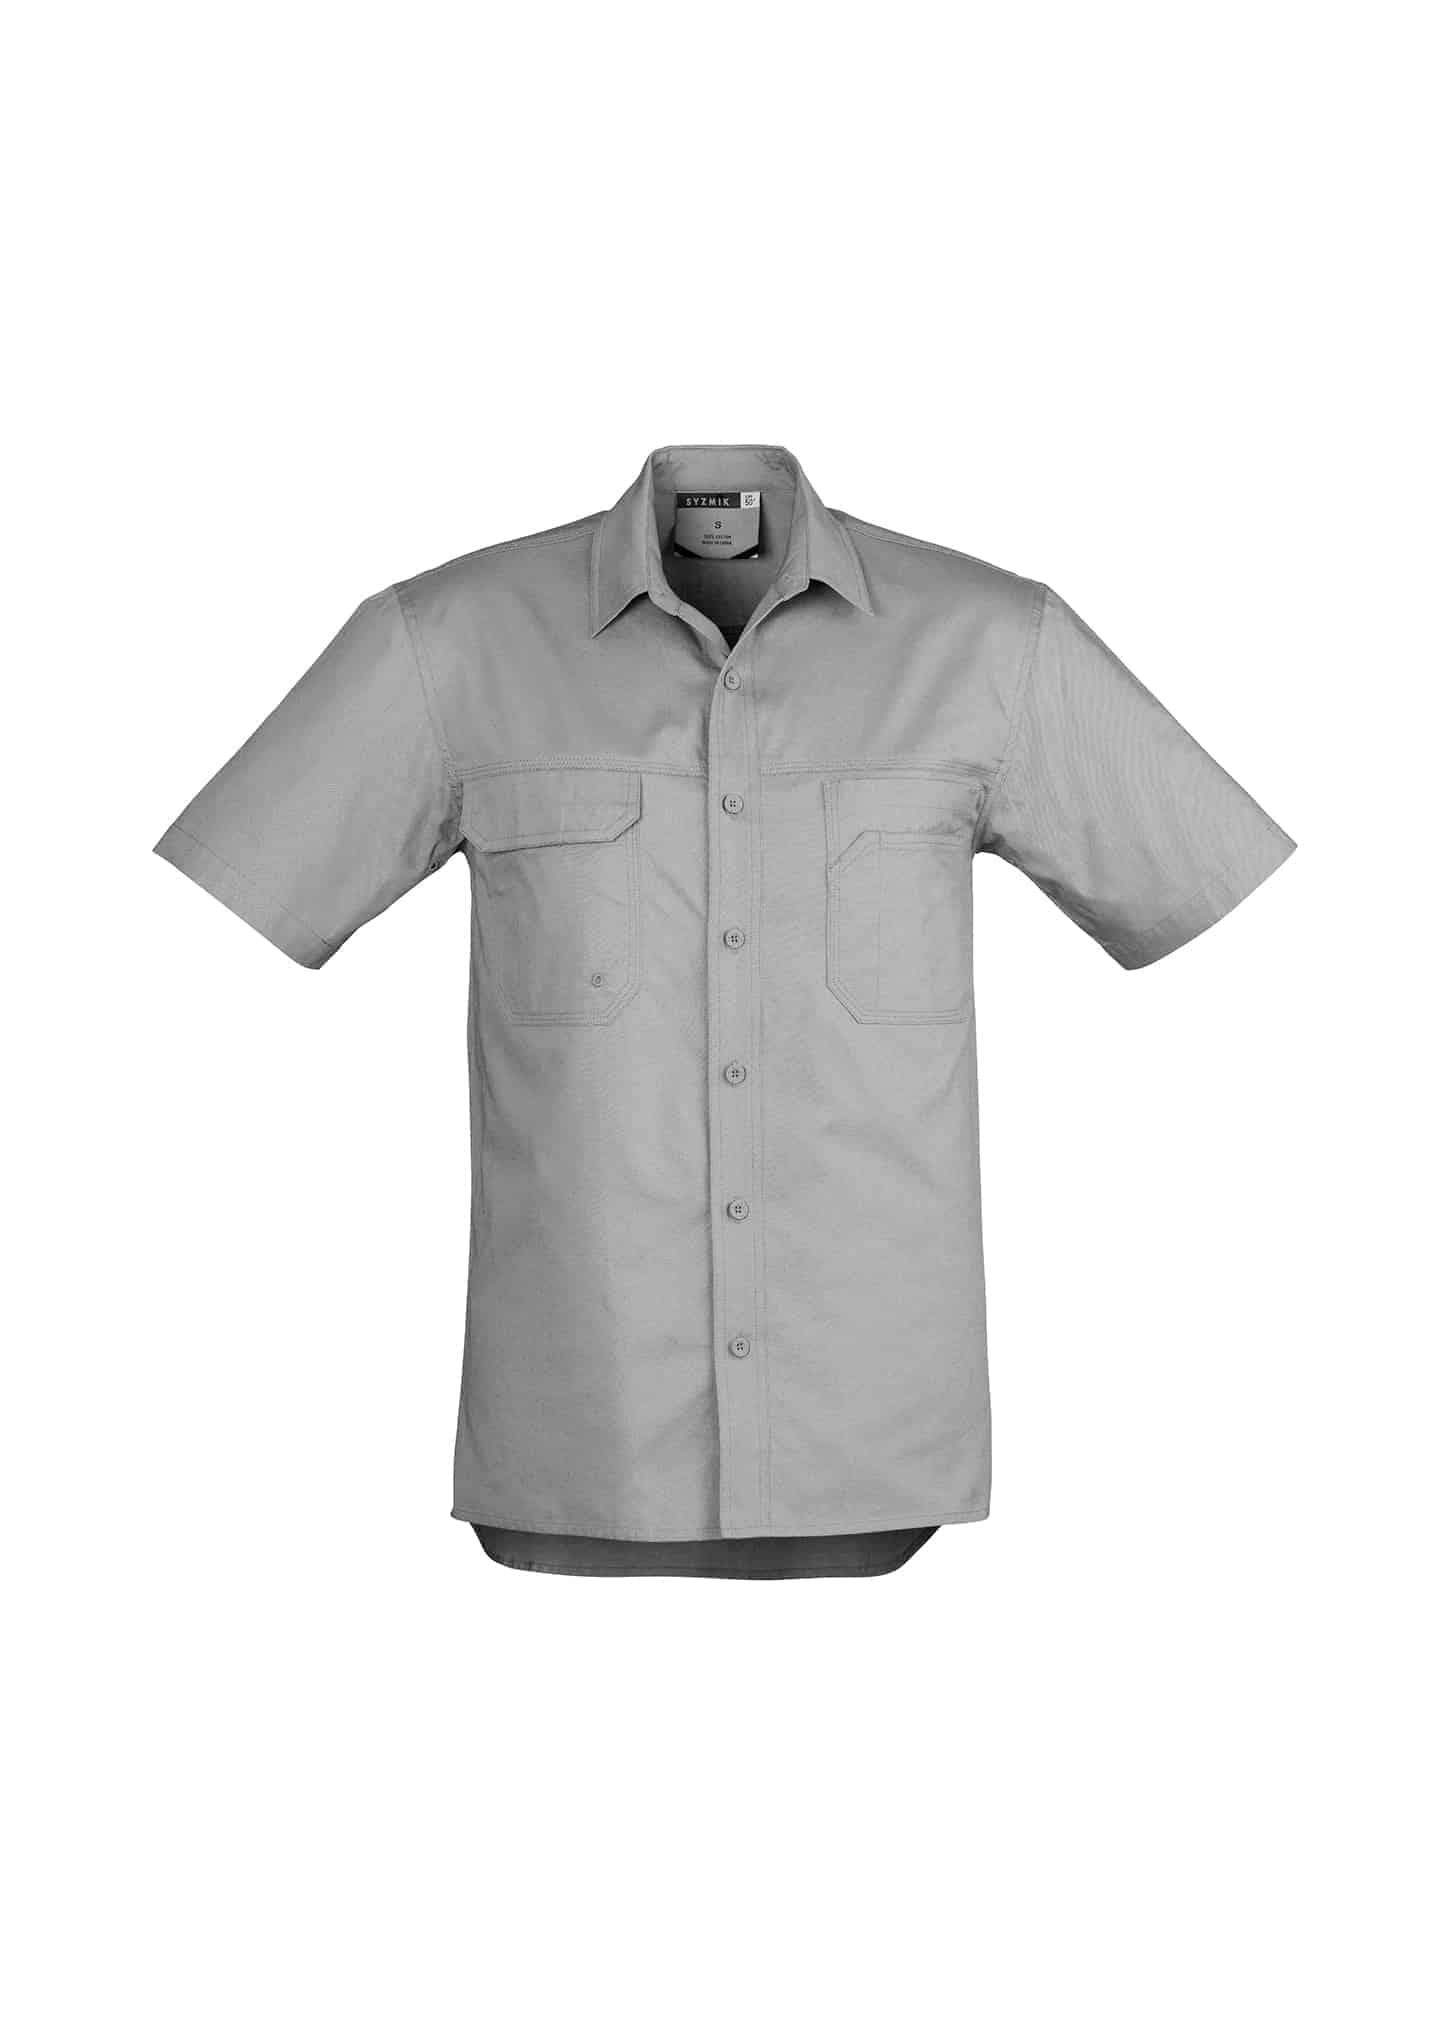 Mens Light Weight Tradie Shirt - Short Sleeve